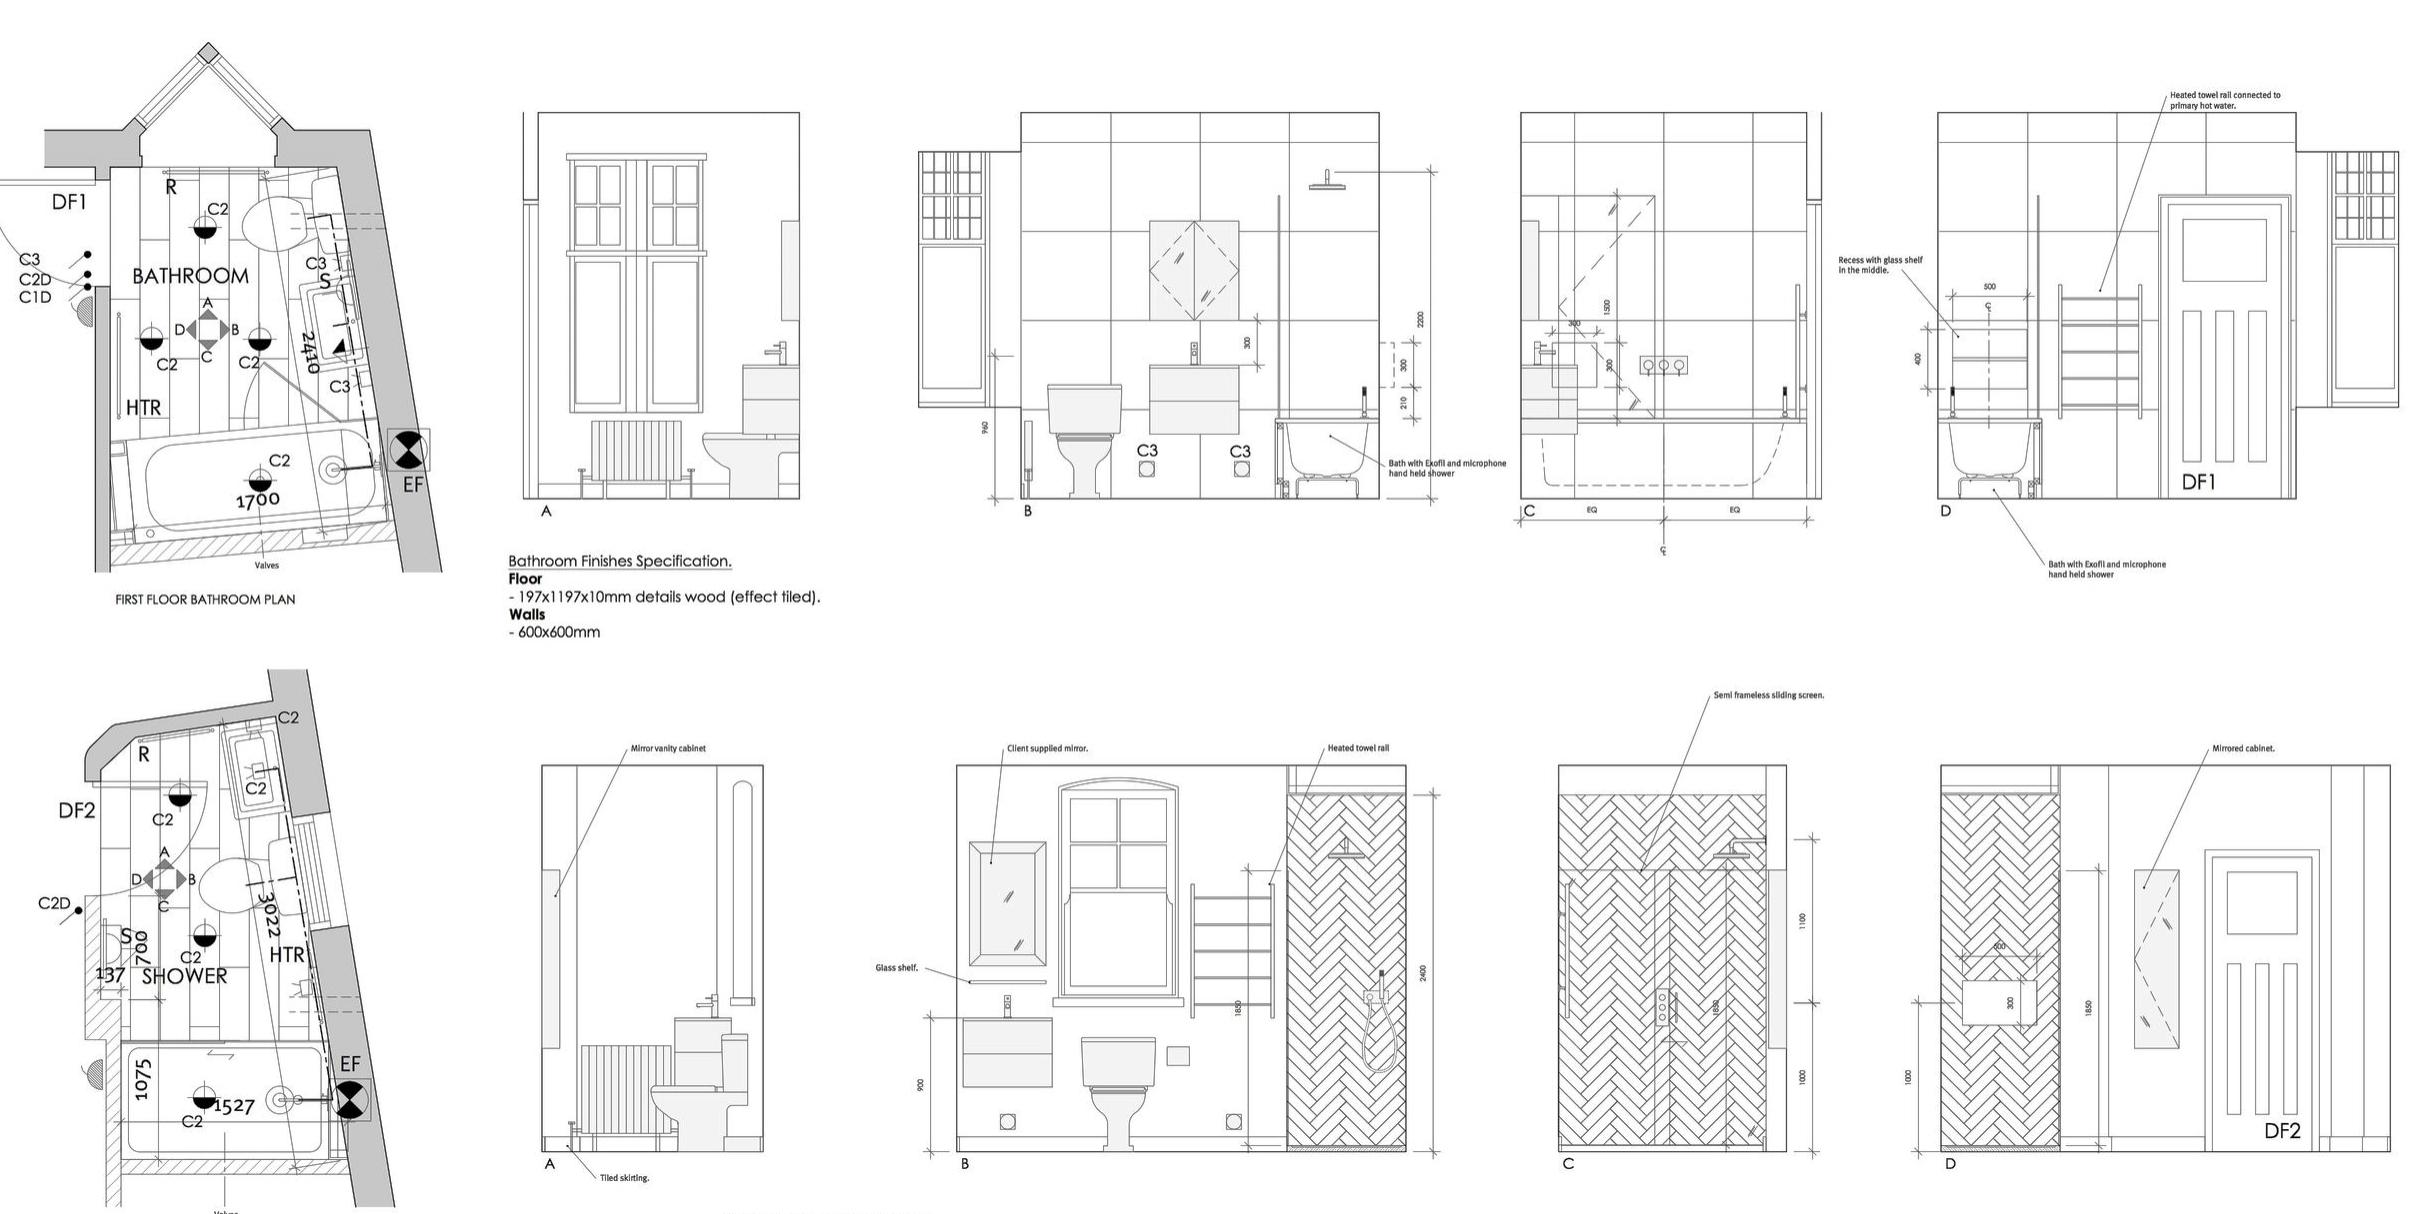 C121_Horn Lane_WD_bathrooms FF copy.jpg